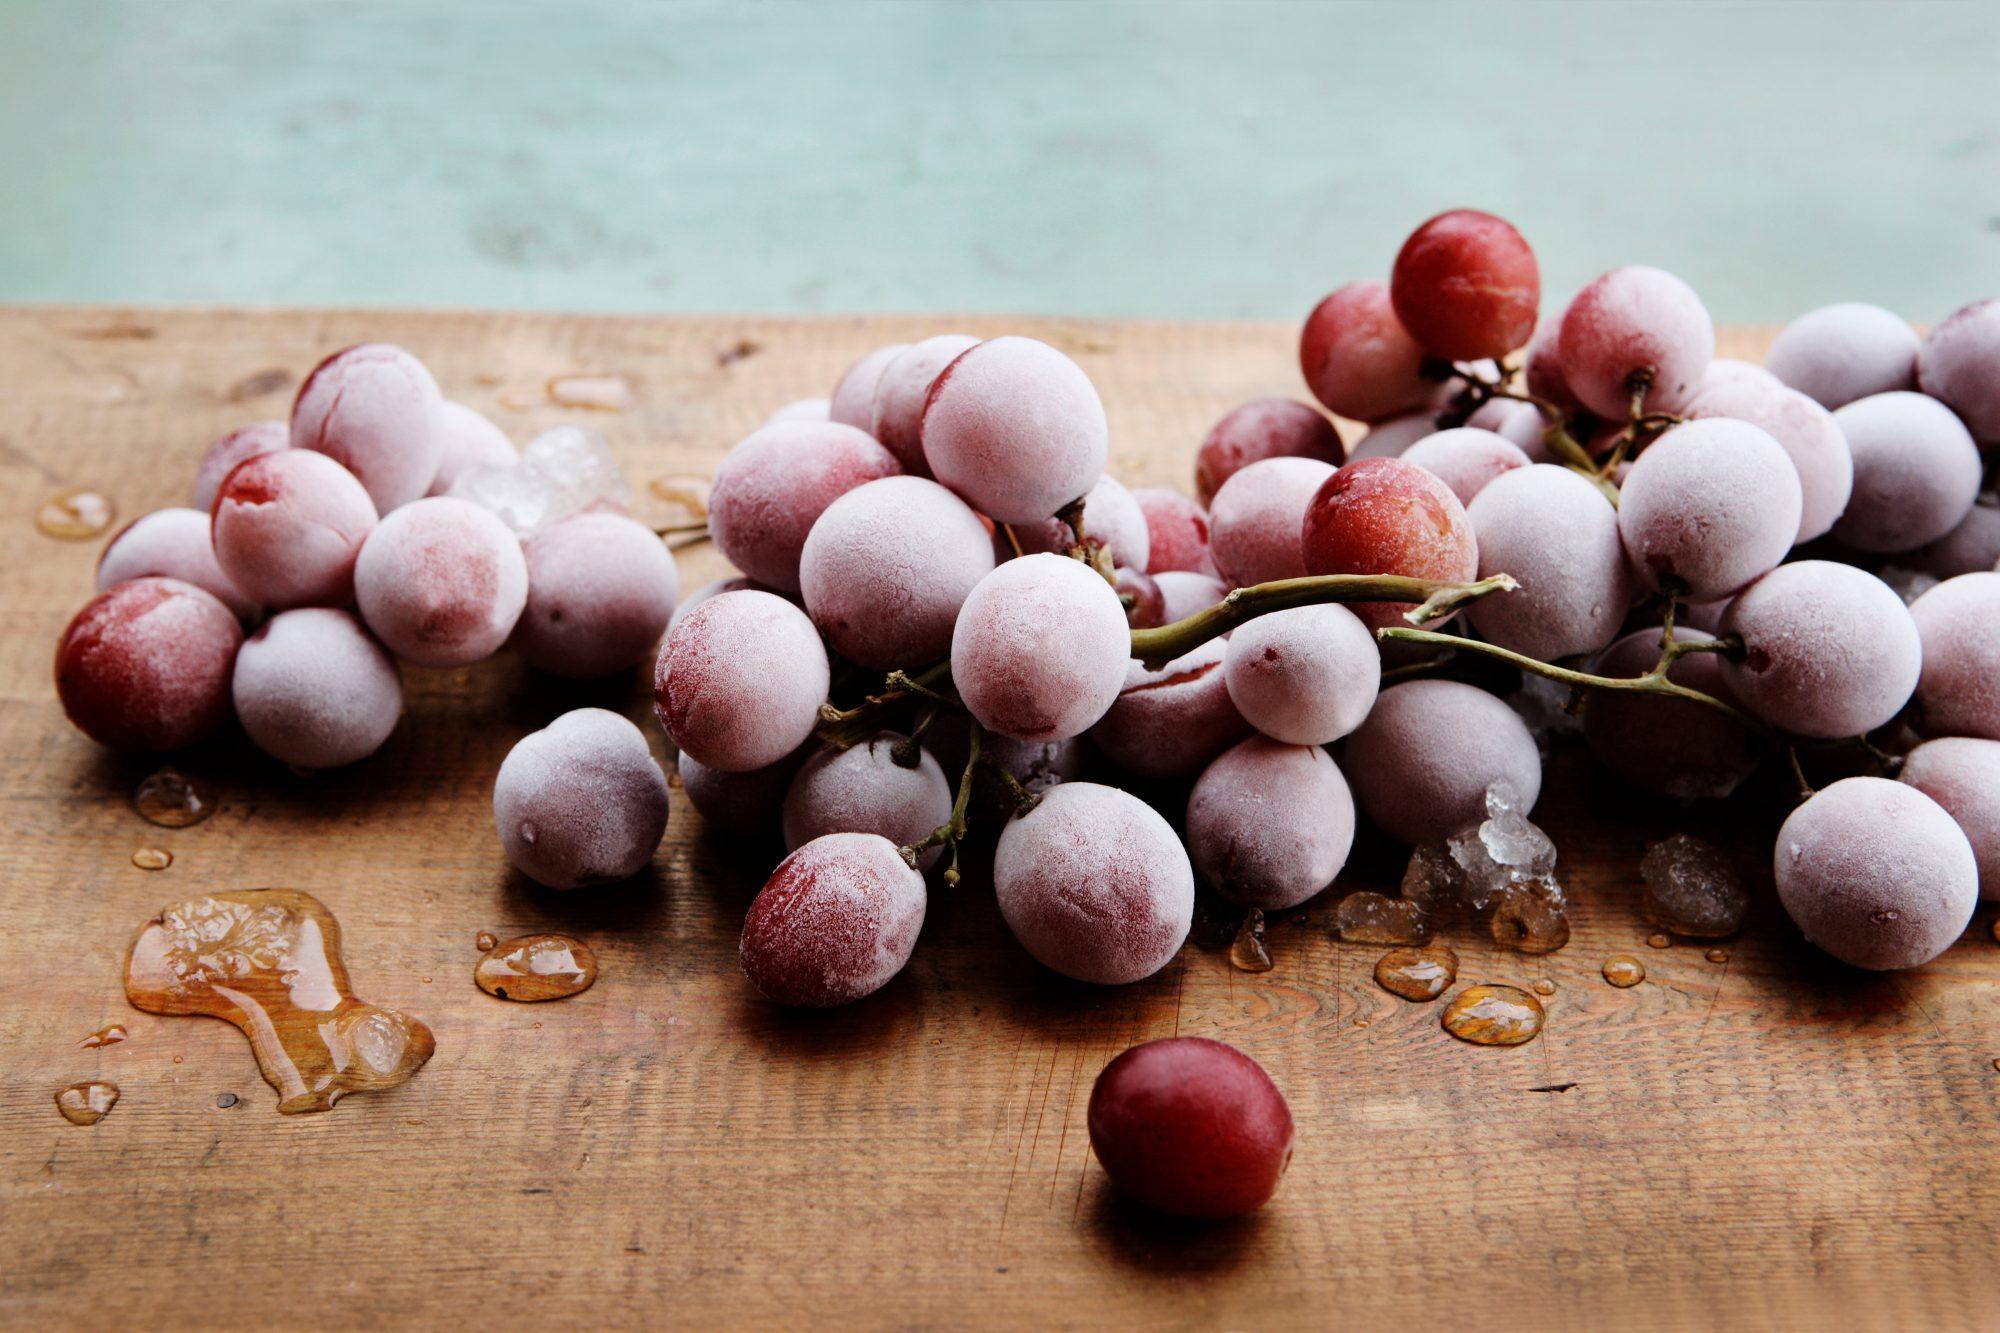 Frozen grapes tout Getty 8/25/20